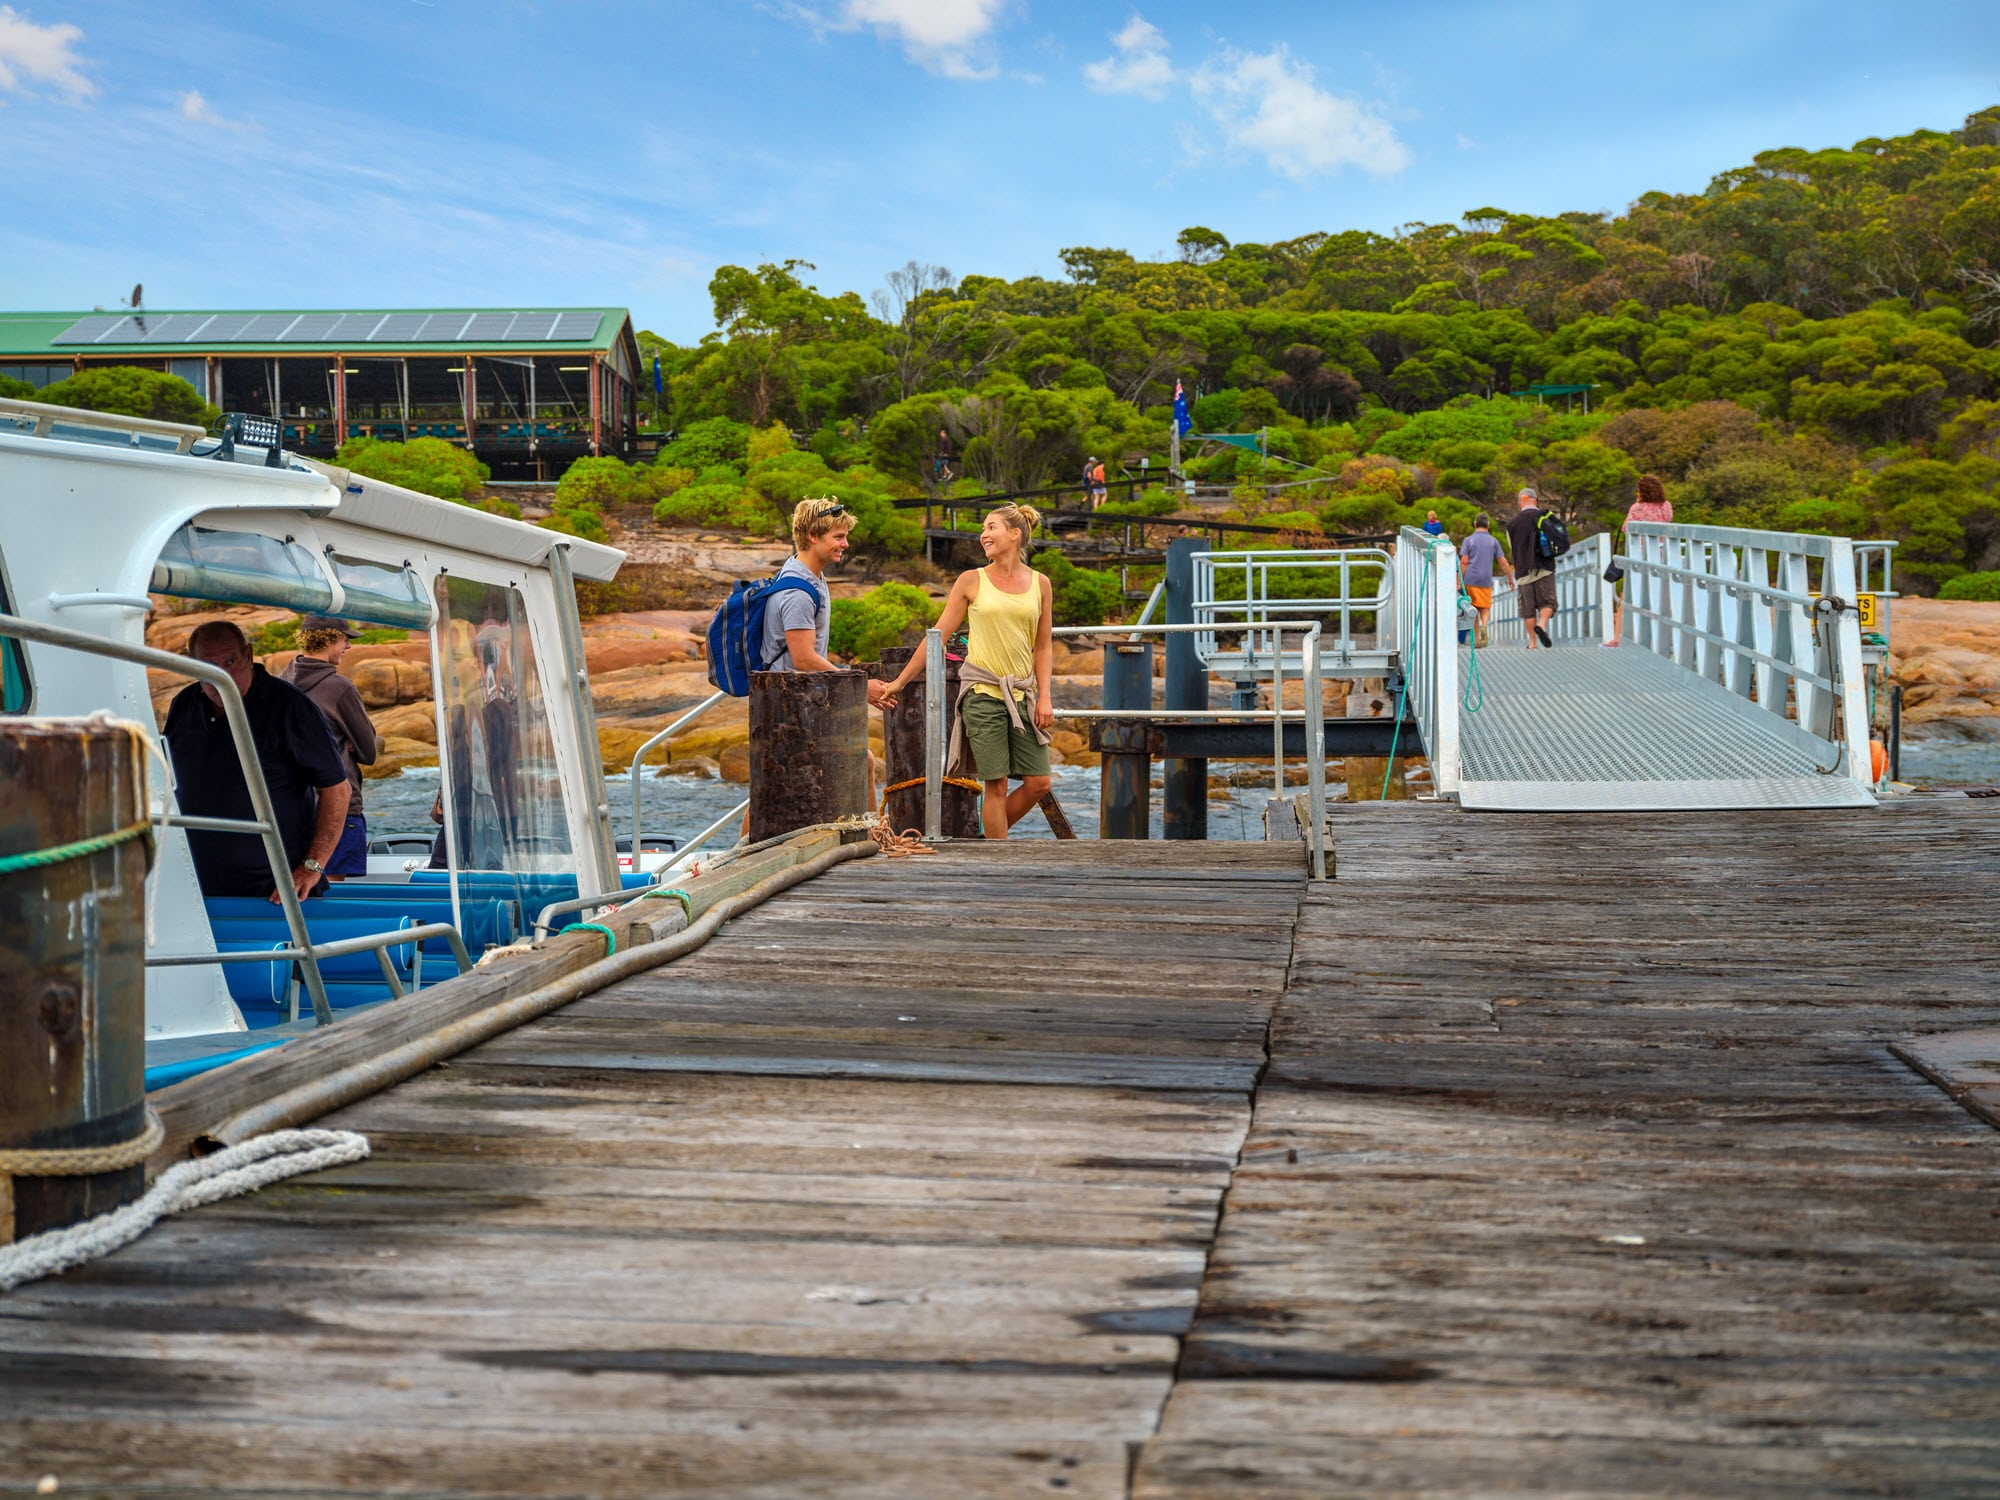 Couple boarding a boat on Woody Island, Esperance.